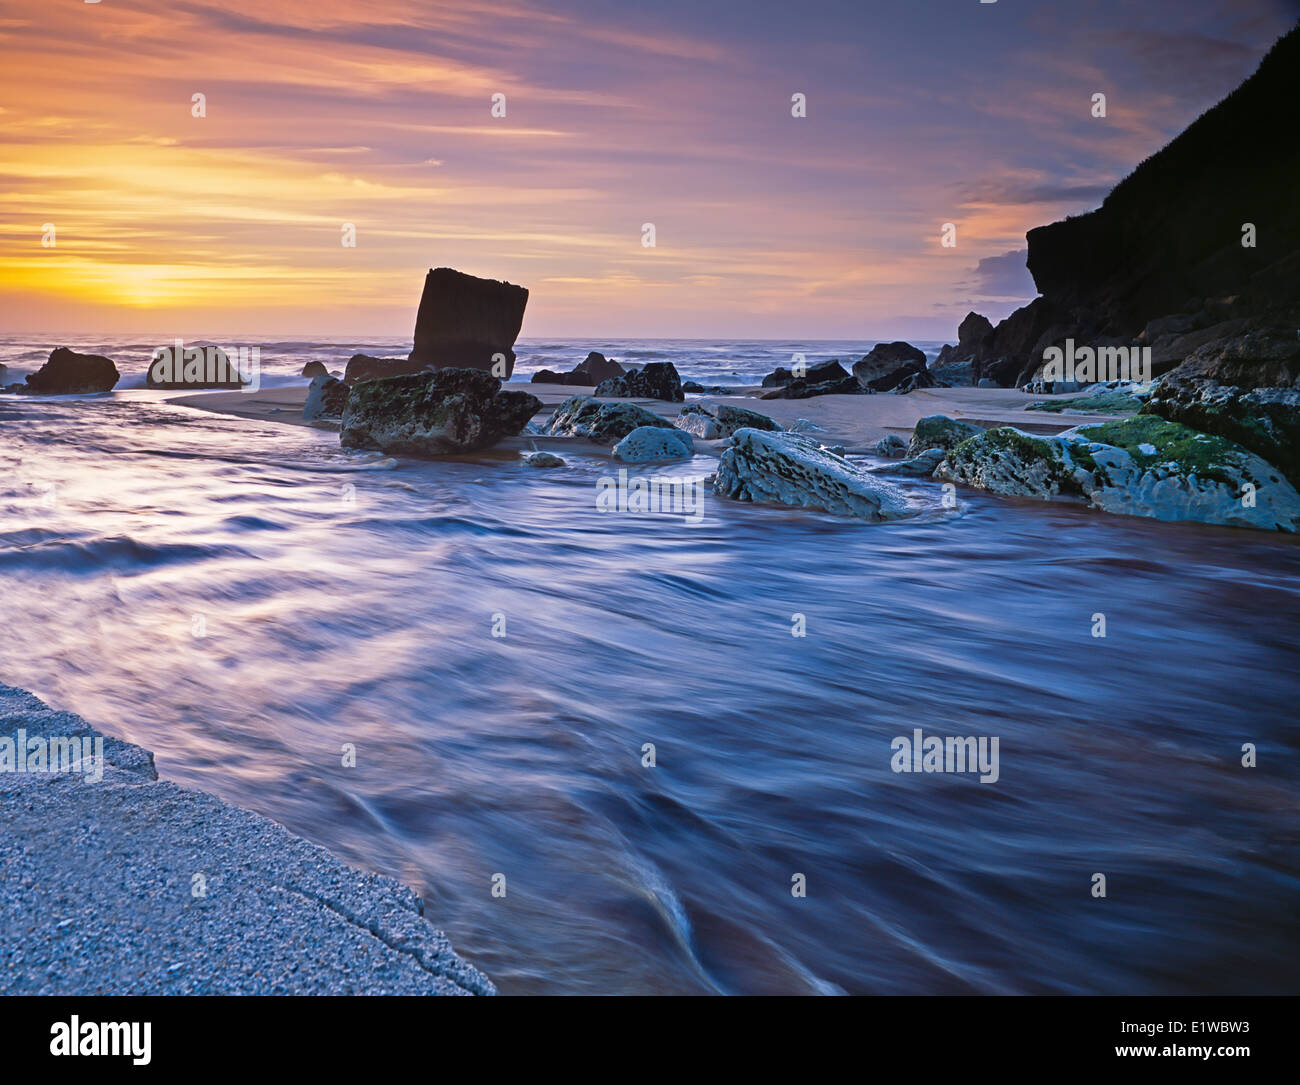 Scotts Beach, Kohaihai River, Nuova Zelanda Immagini Stock